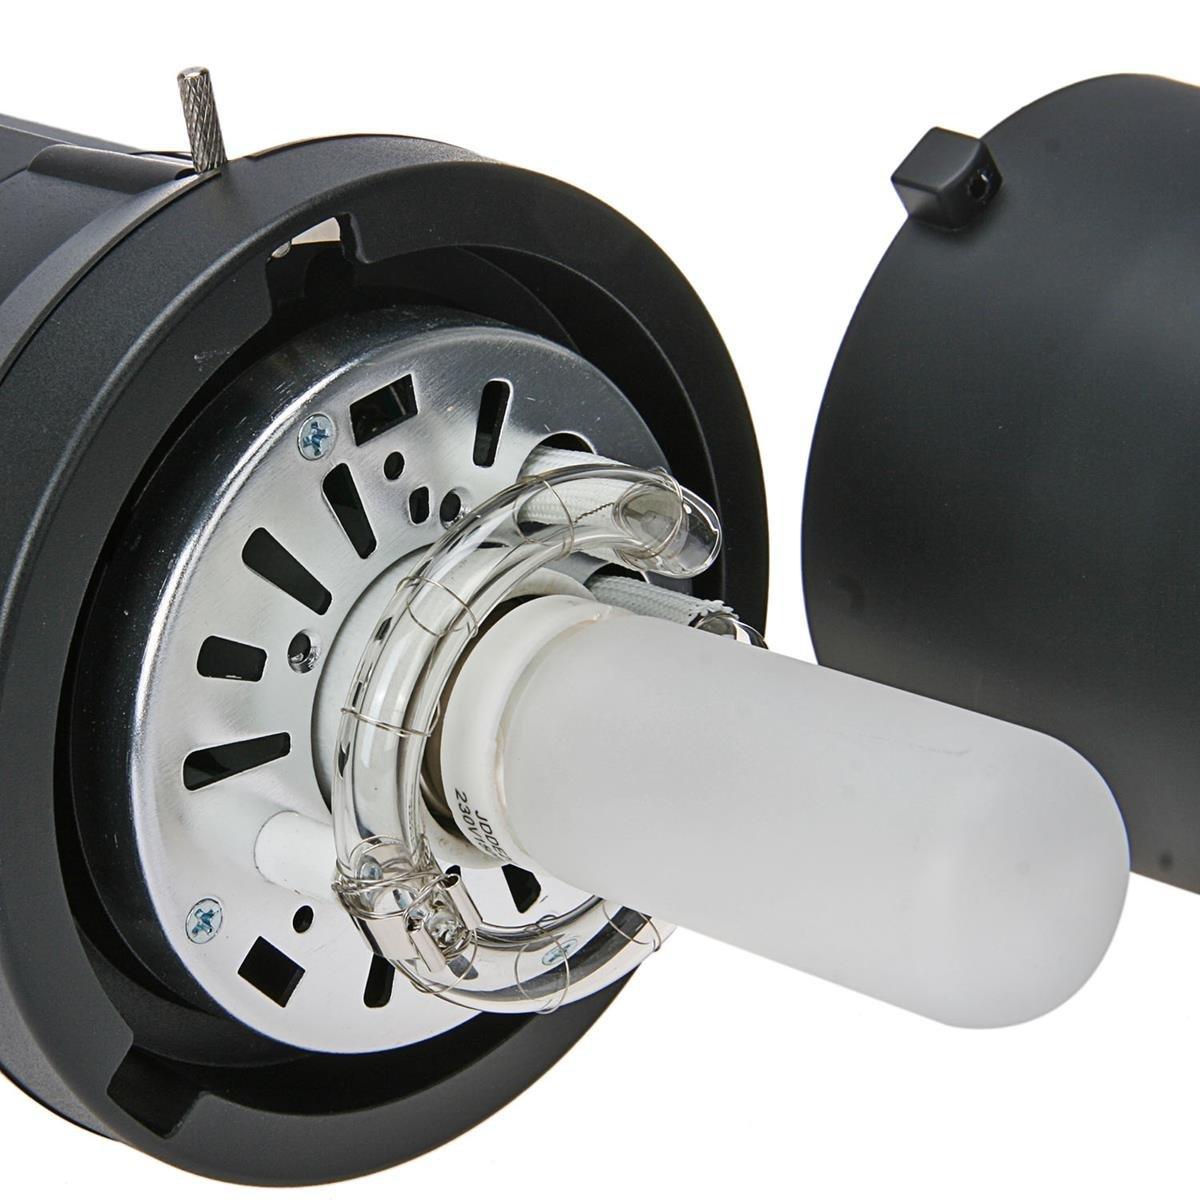 2/x Fomito 150/W 220/V-230/V Bombilla de tubo de flash para Photo Studio luz estrobosc/ópica Flash compacto